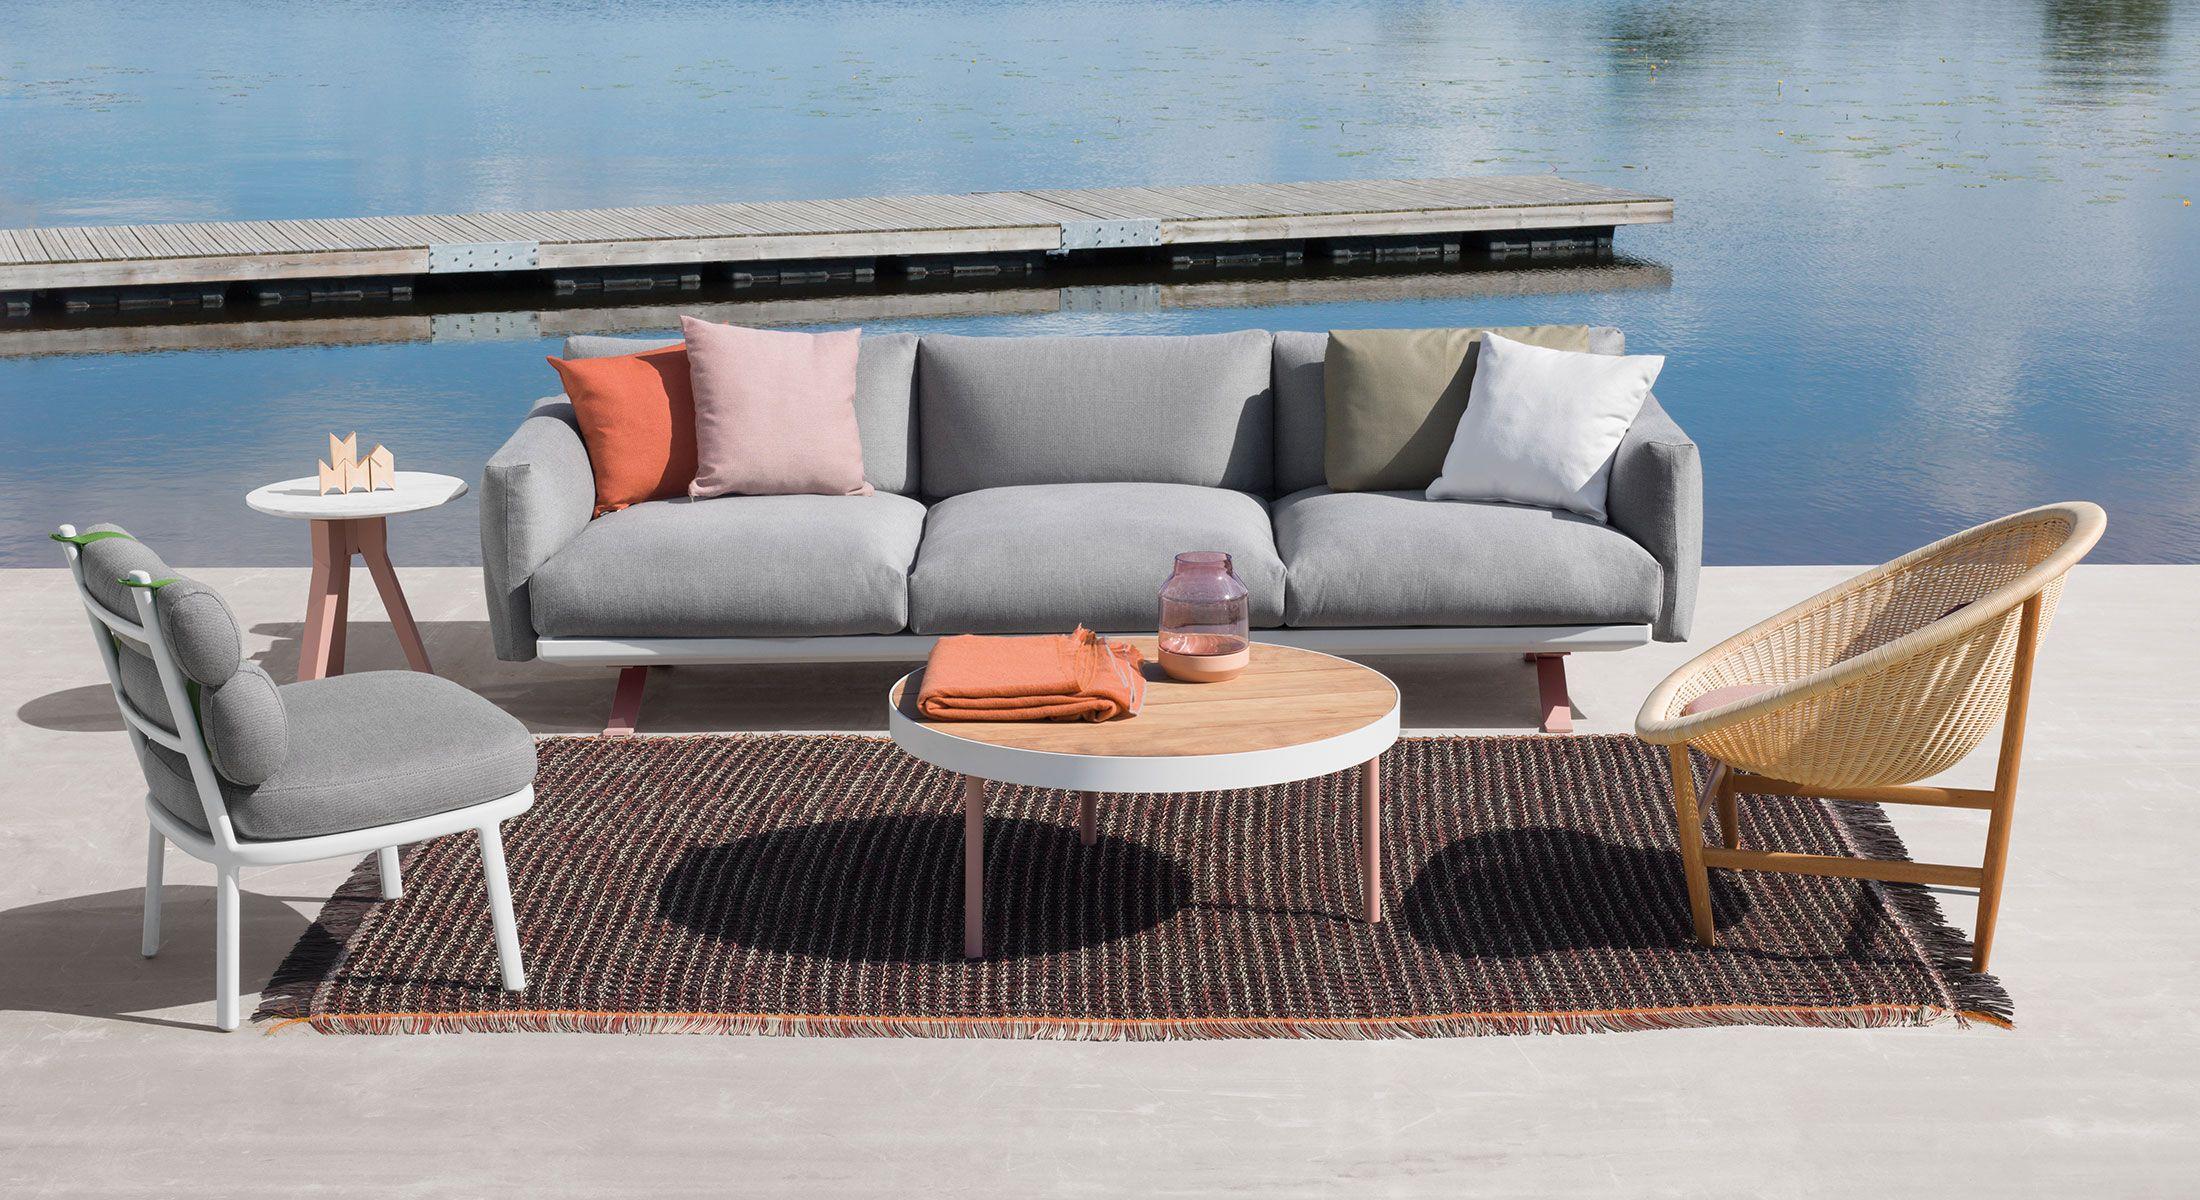 Kettal muebles de dise o de exterior mobiliario exterior mobiliario exterior muebles para - Mobiliario para jardin ...